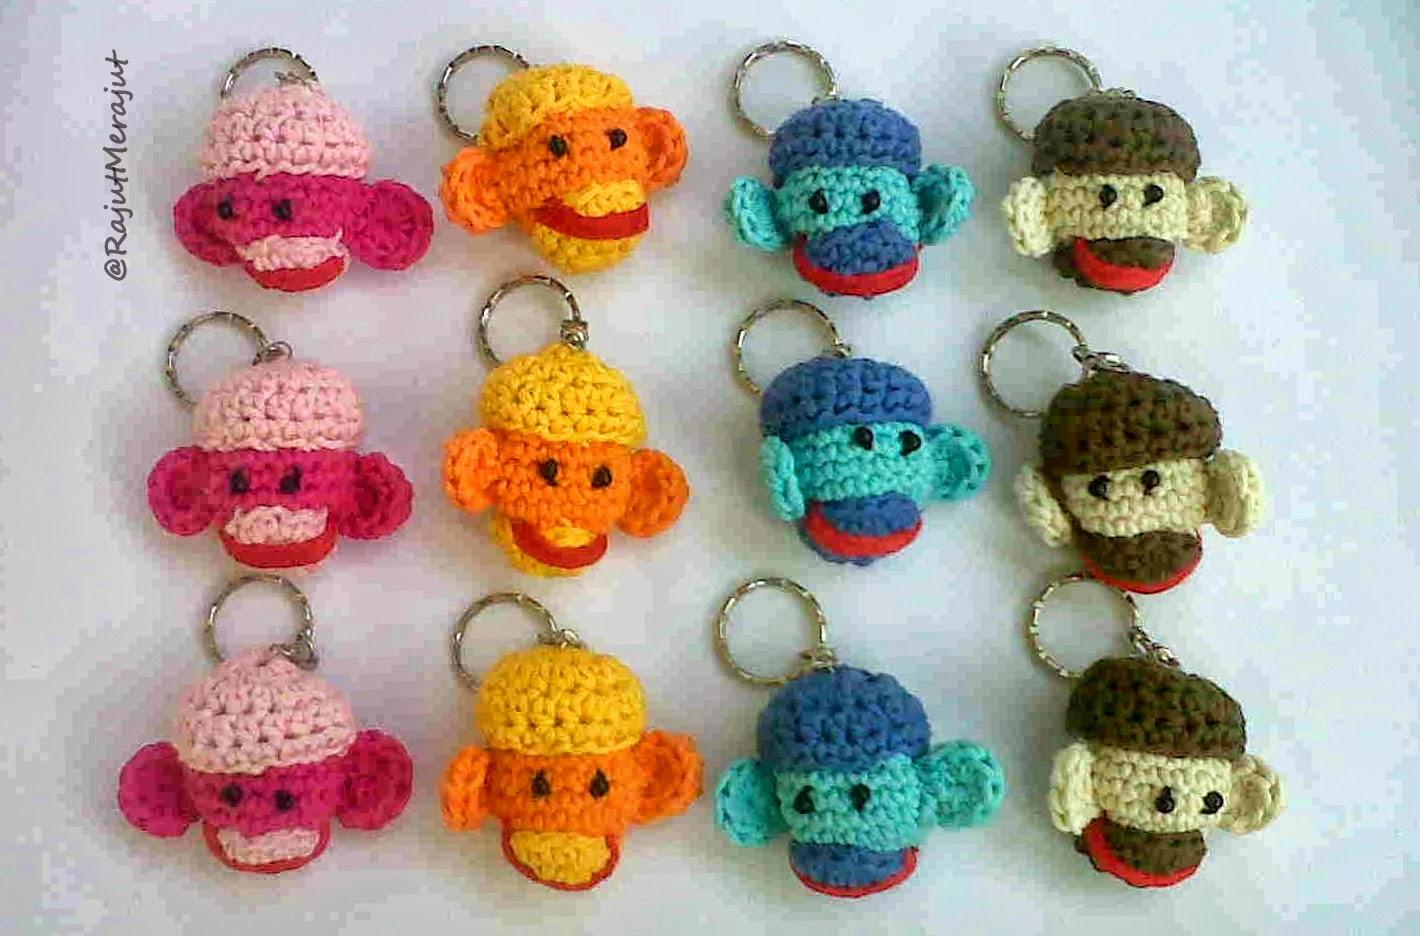 Pola Gratis Gantungan Kunci Amigurumi : Boneka rajut amigurumi boneka rajut beruang crochet amigurumi